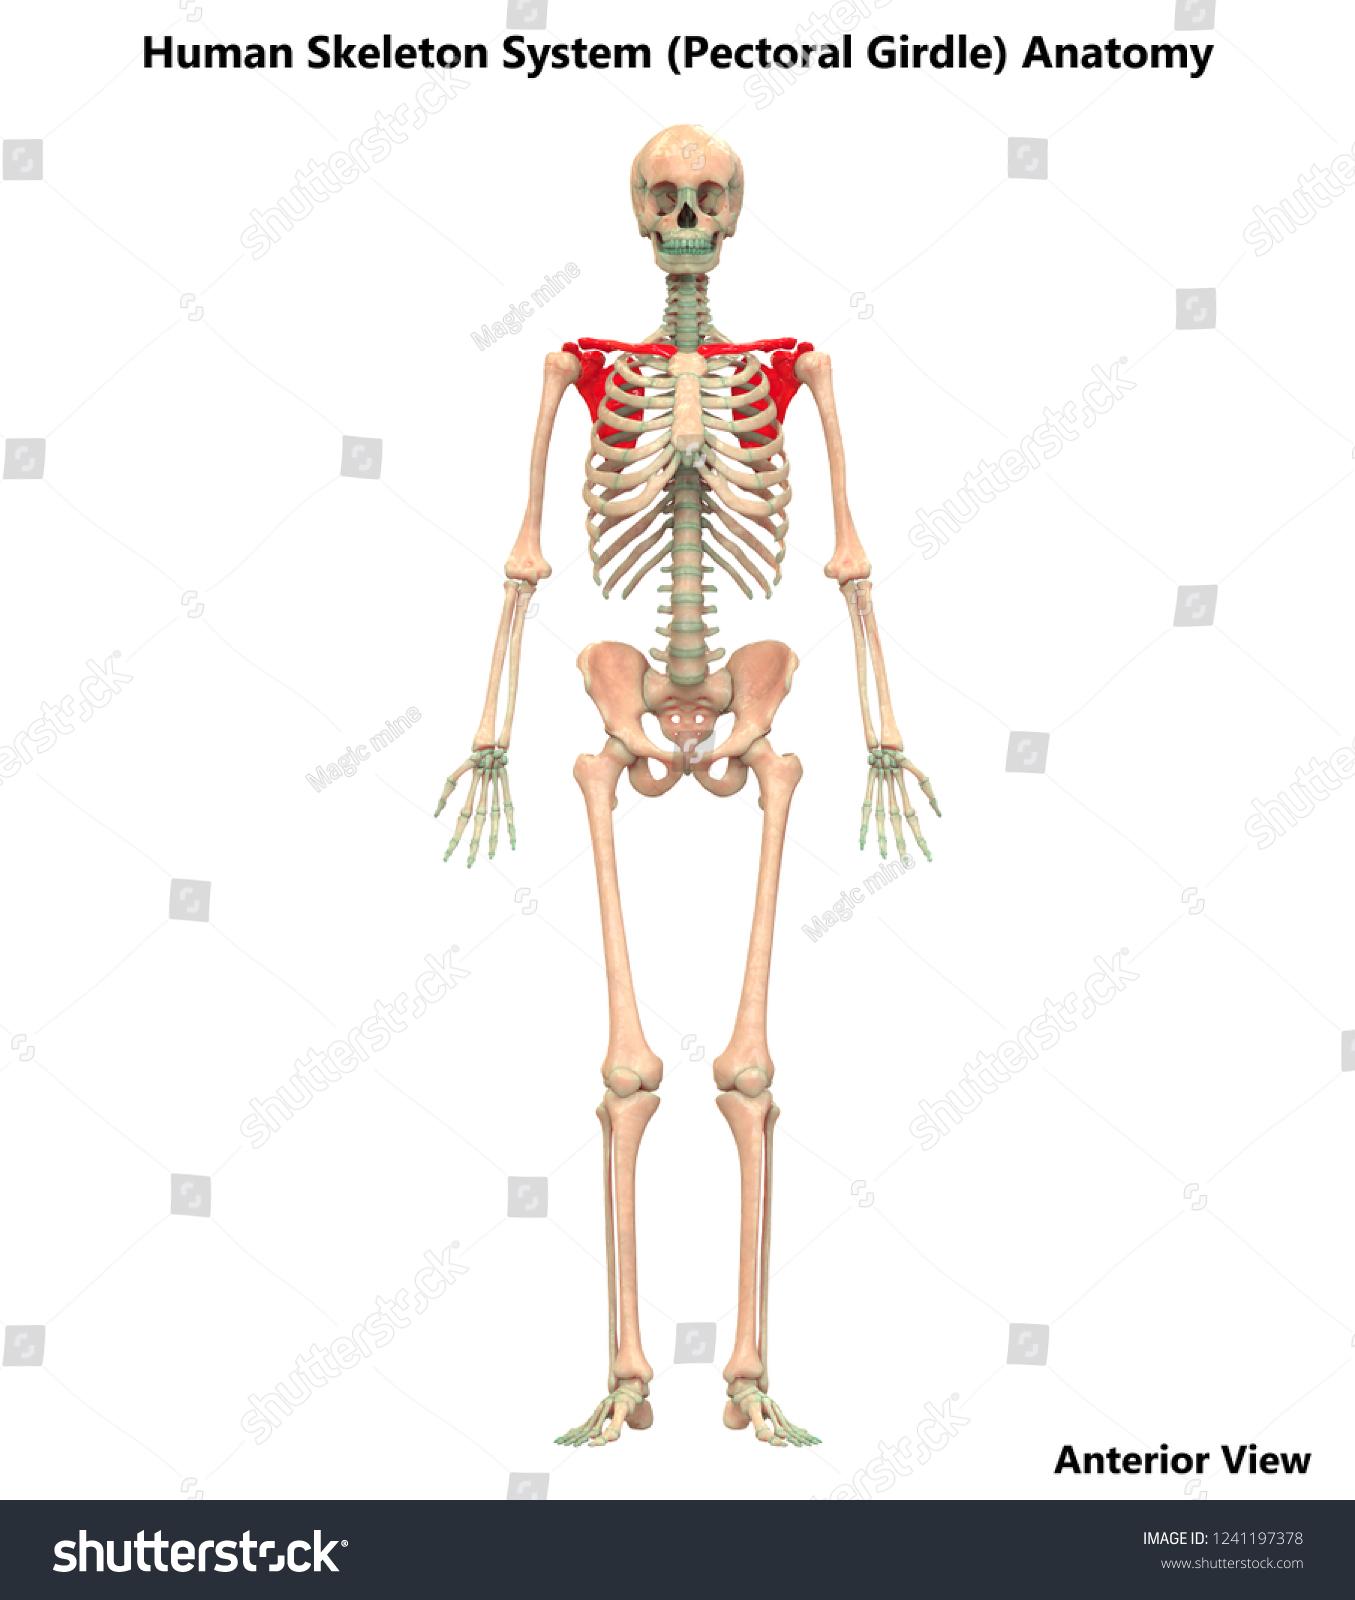 Human Skeleton System Pectoral Girdle Anatomy Stock Illustration